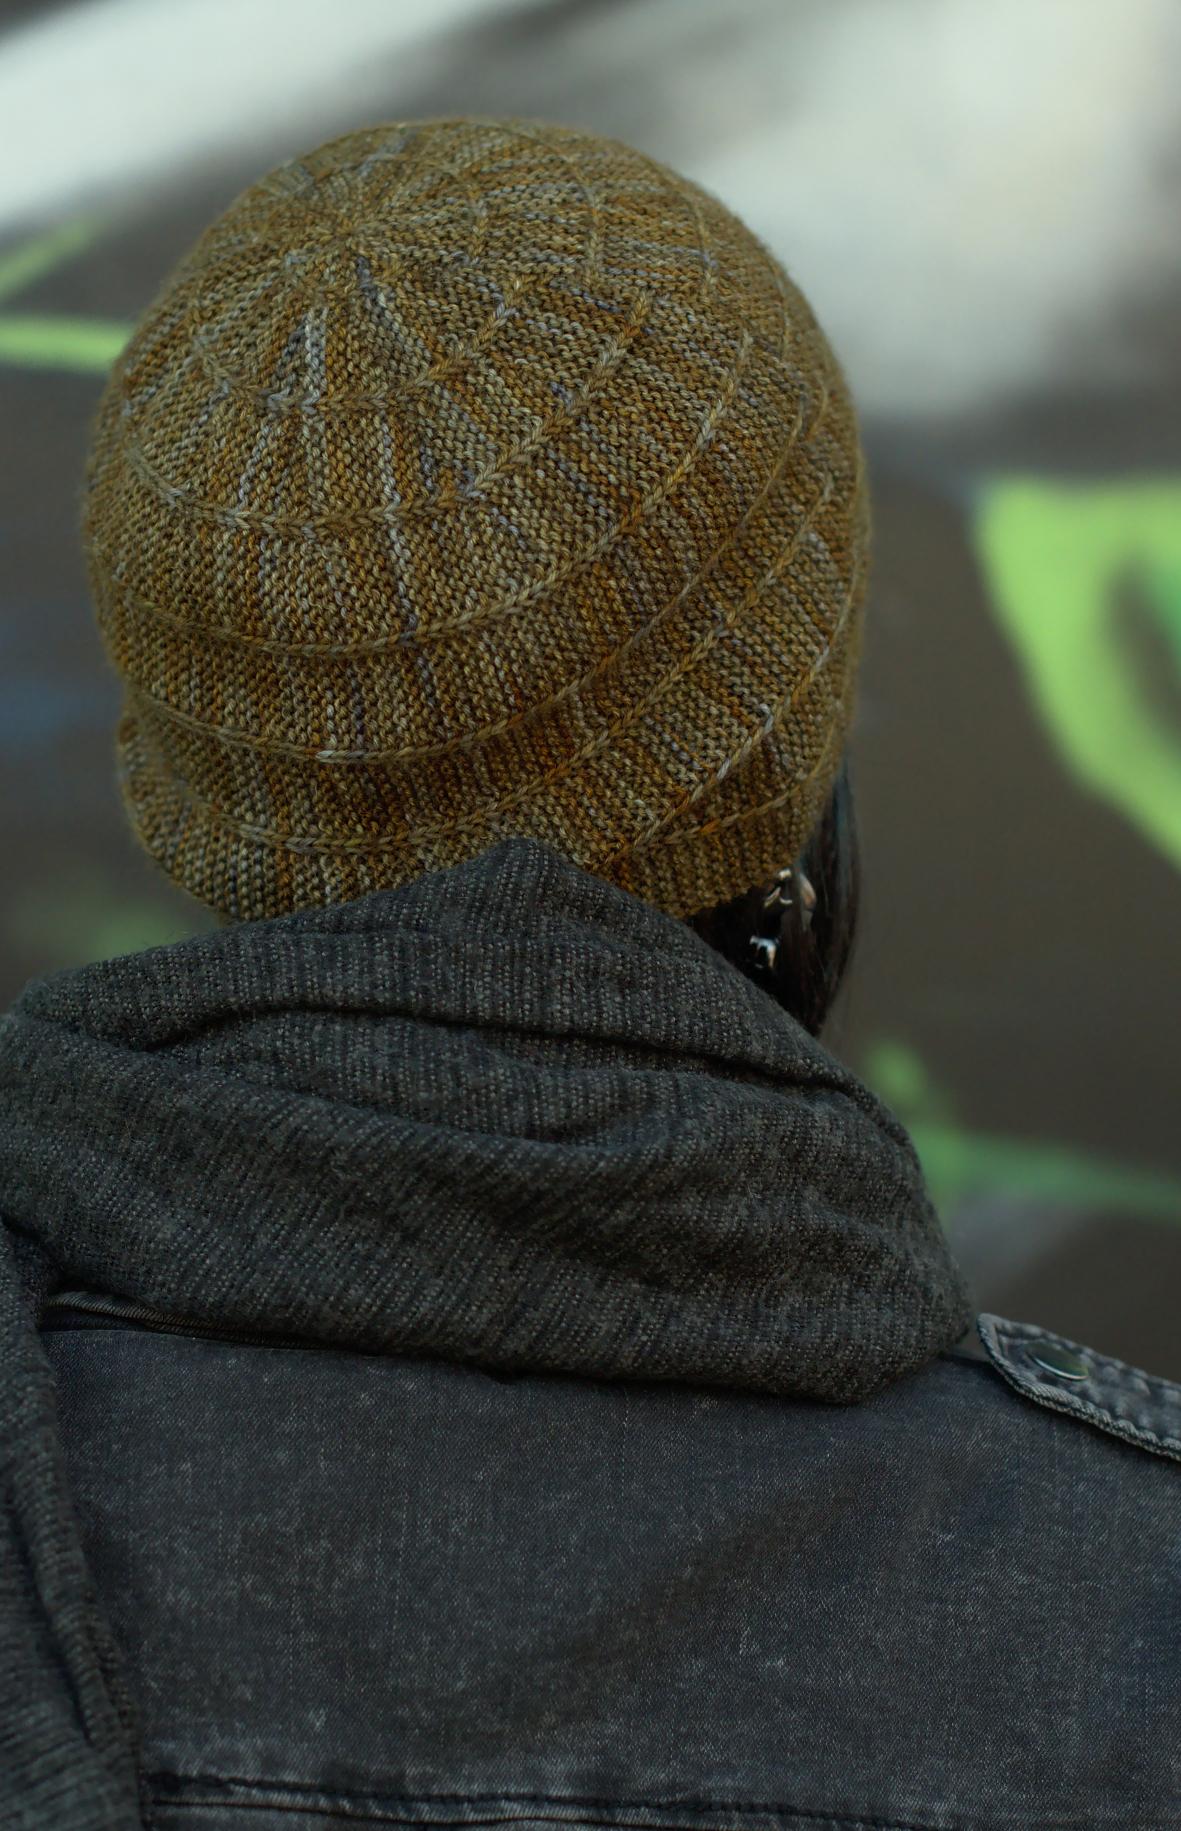 Circled 3 sideways knit Hat knitting pattern with negative semi circles